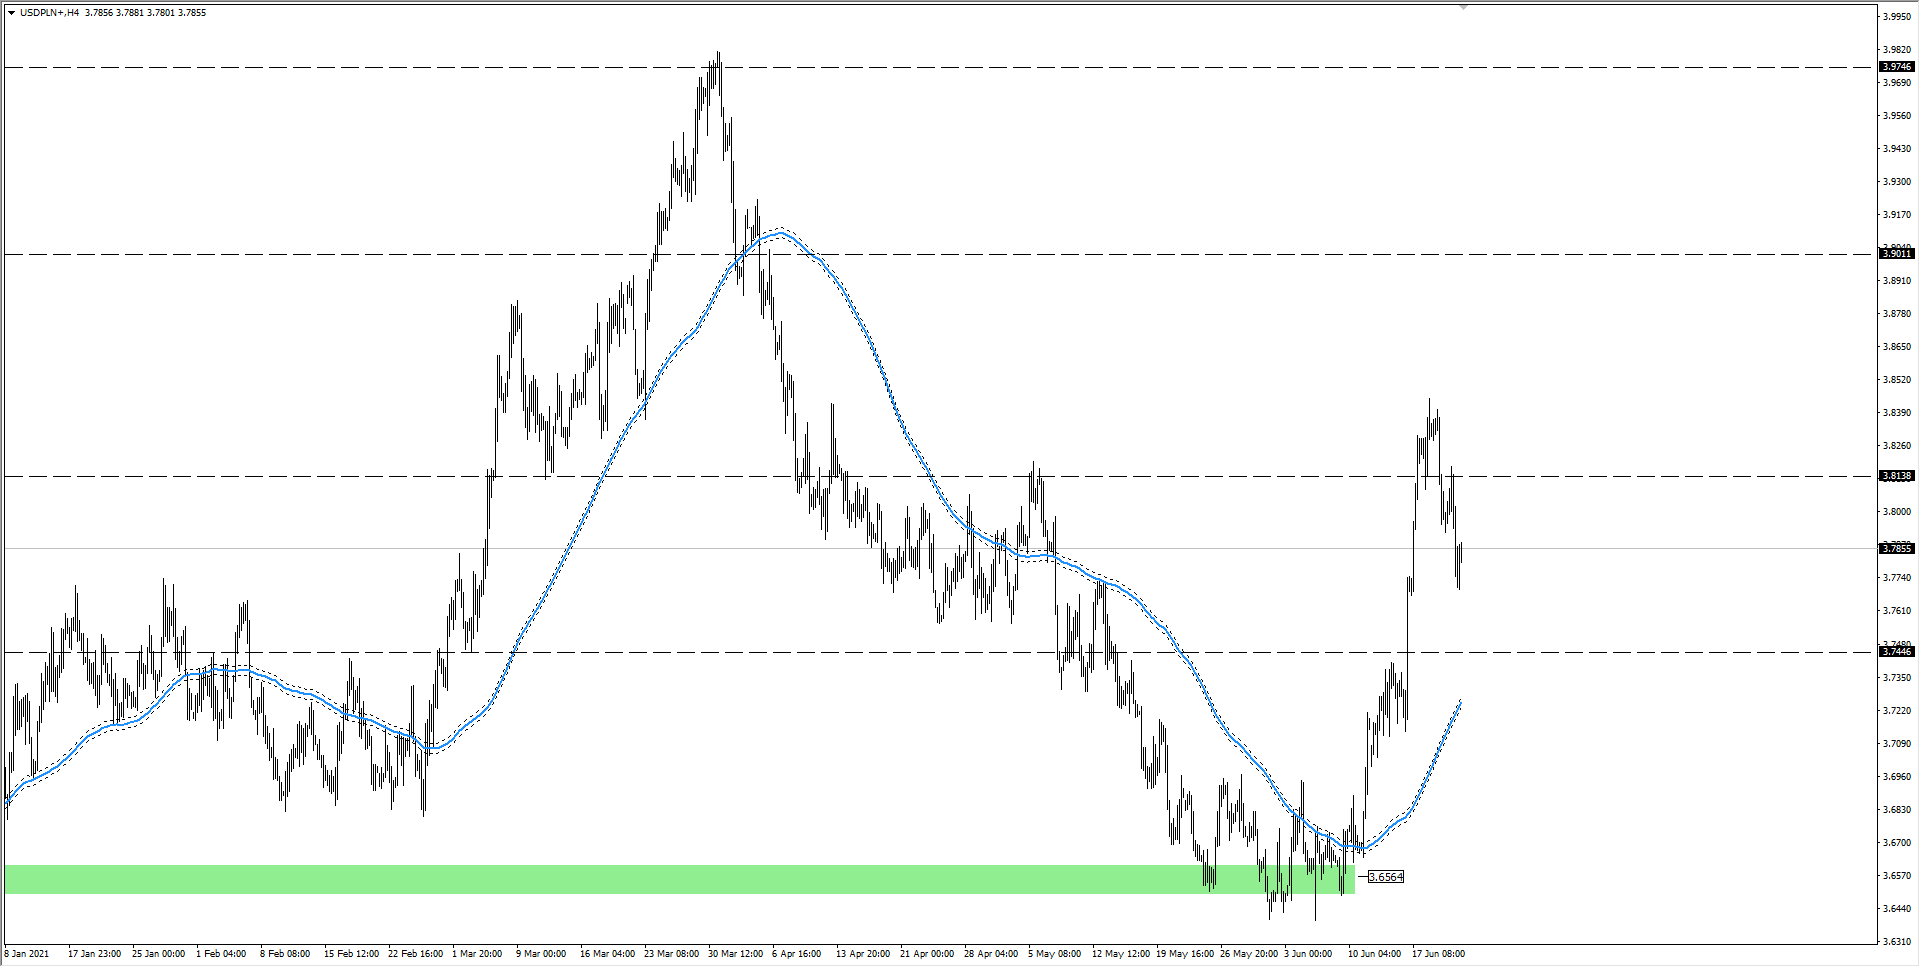 wykres Kurs dolara USDPLN H4 23.06.2021